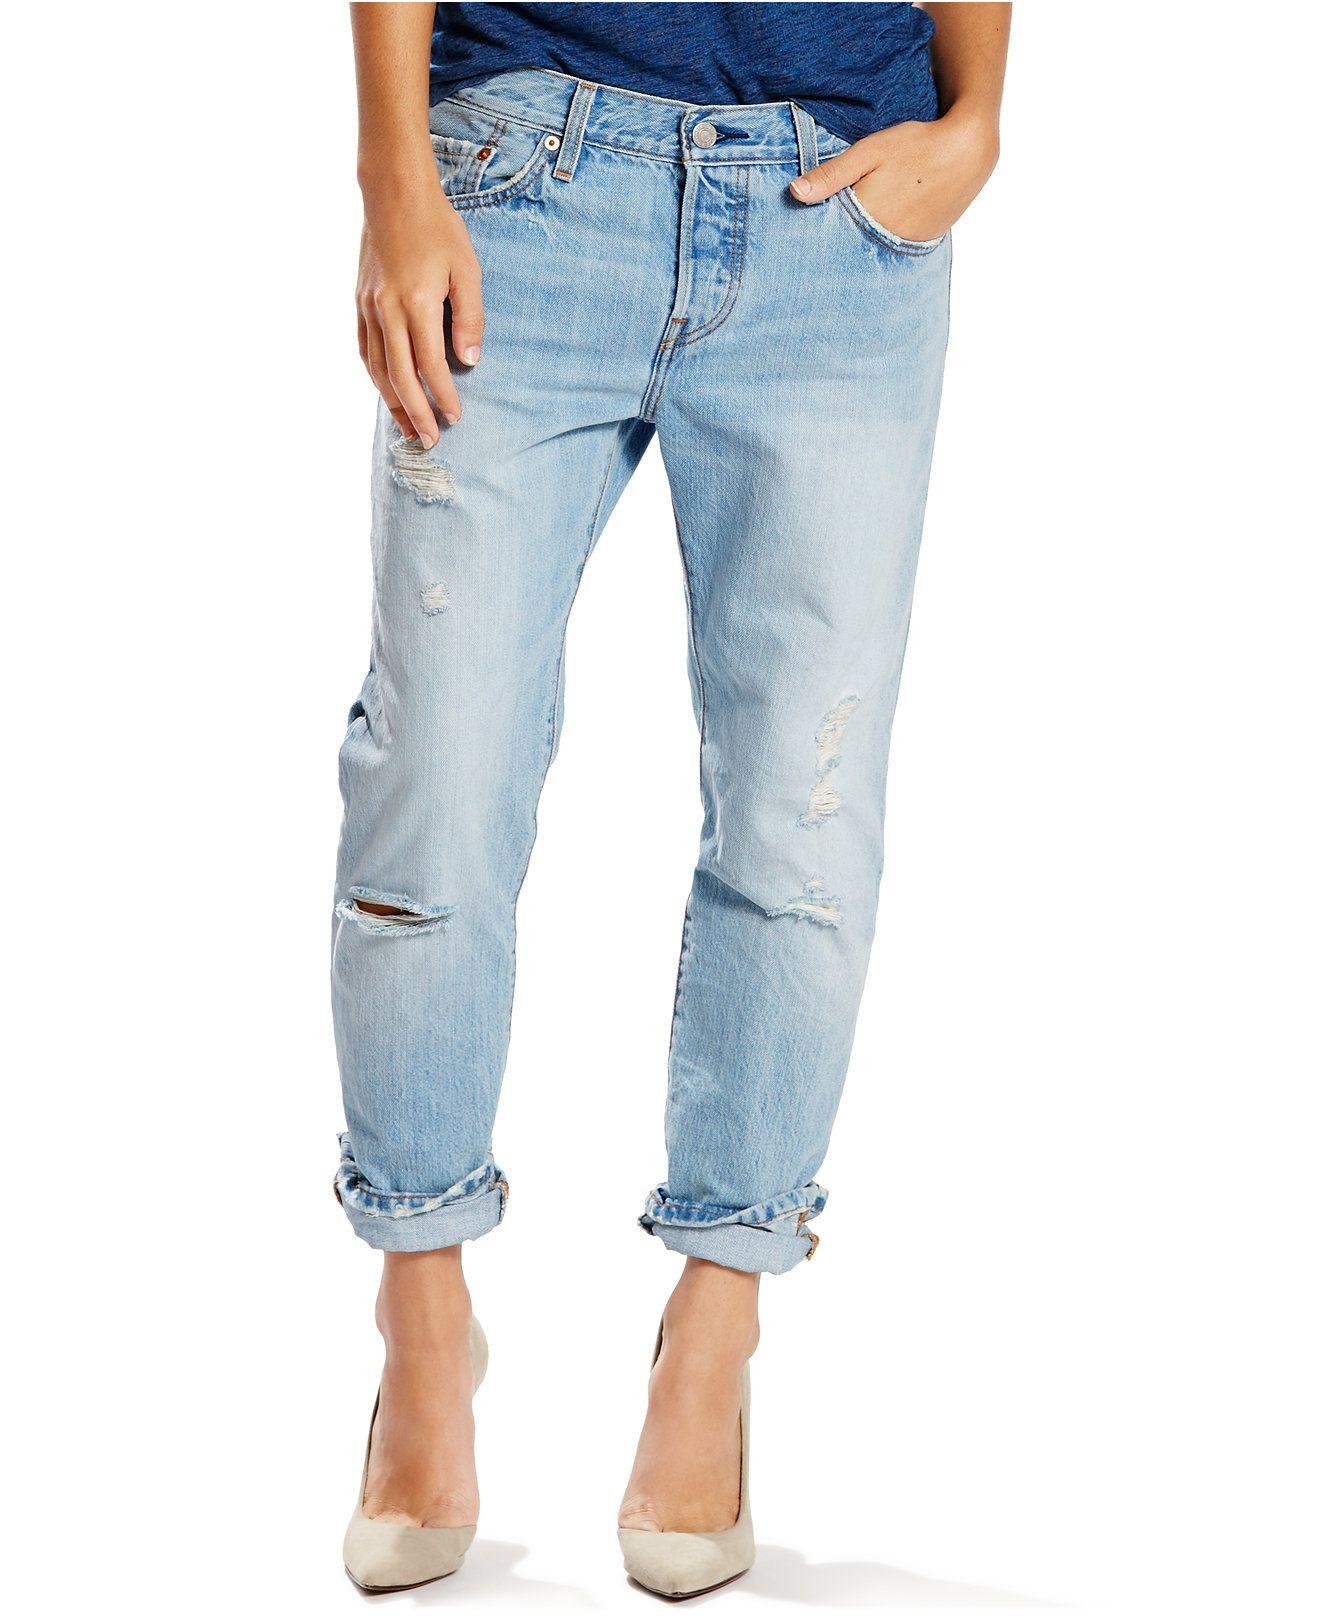 fd73cbbb Levi's® 501® CT Boyfriend Jeans in Turbulent Indigo | da closet of ...